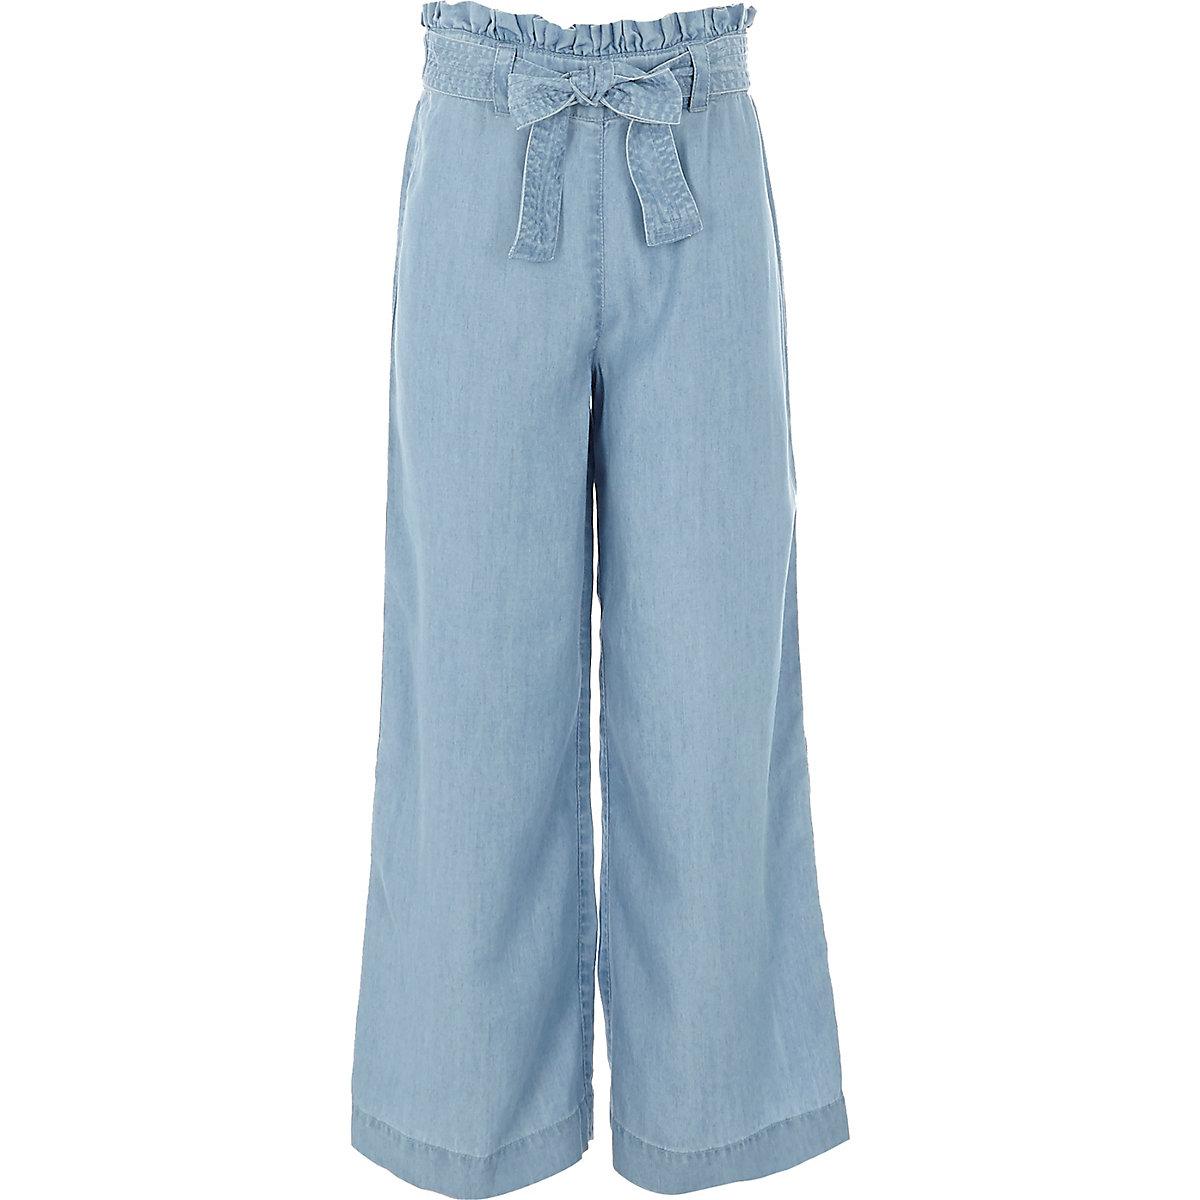 Girls light blue wide leg denim trousers